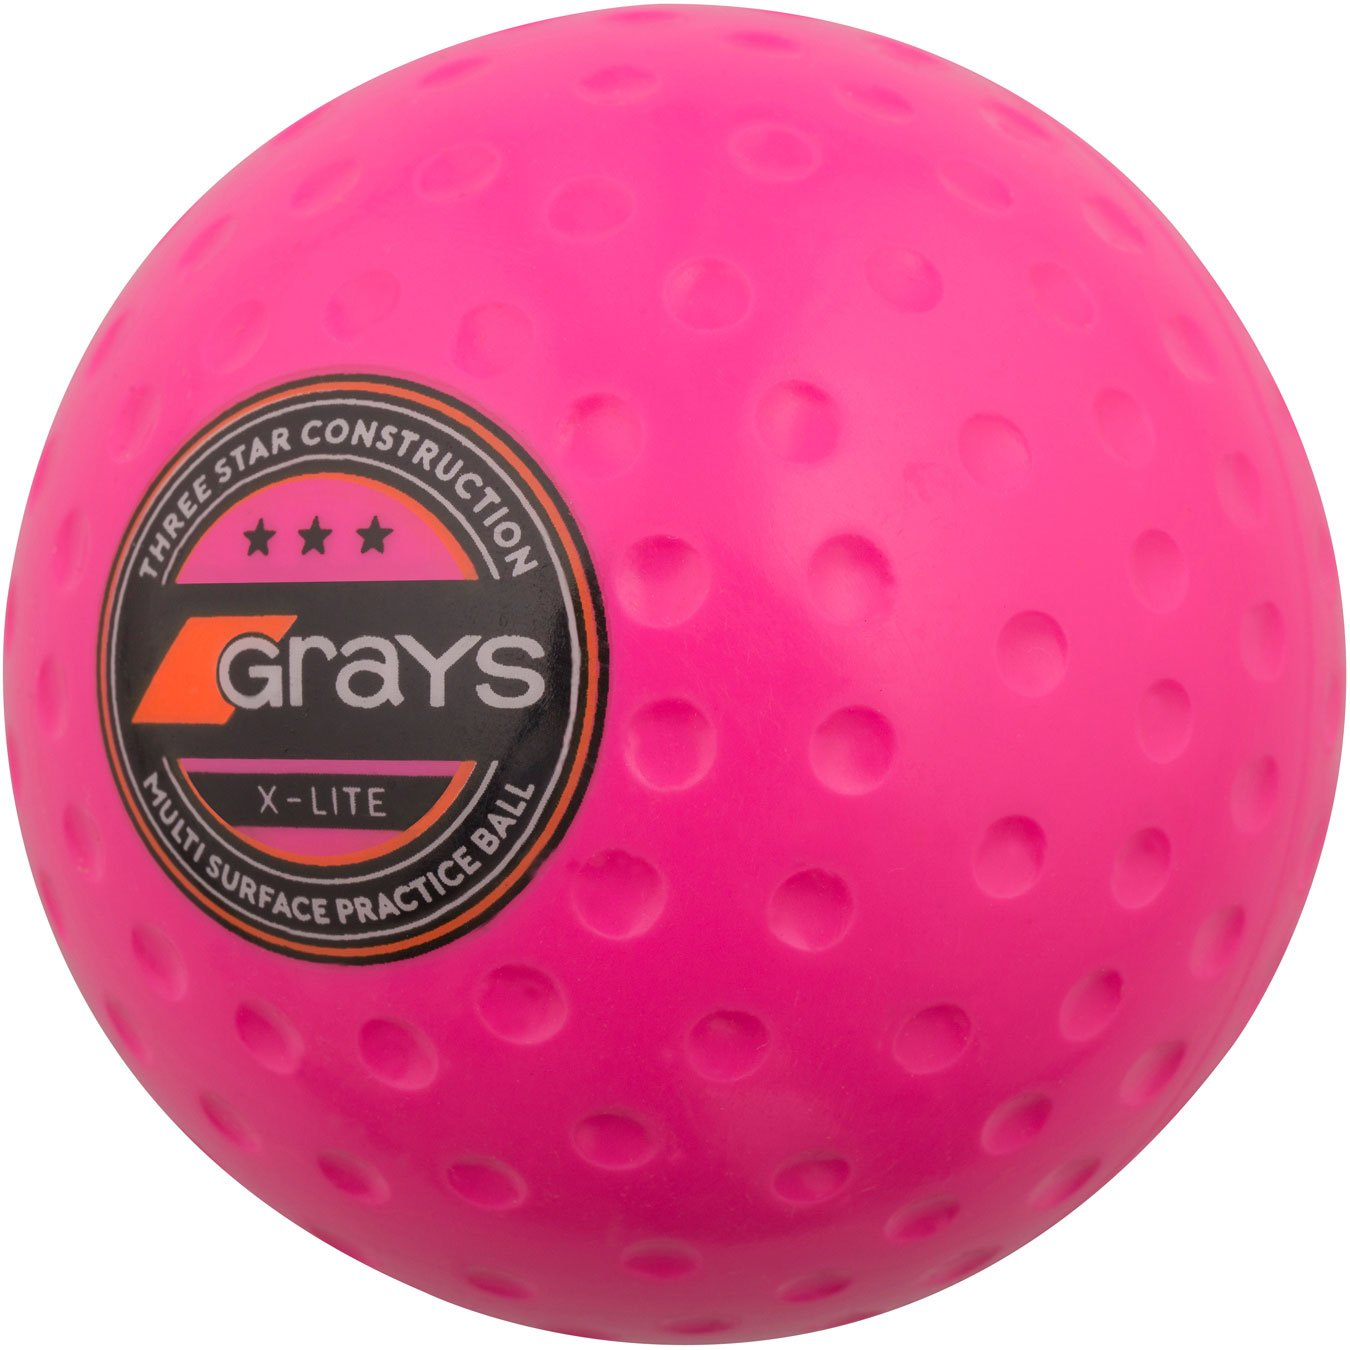 GRAYS-Lite Hockey Ball (2017/18) Rose 645700